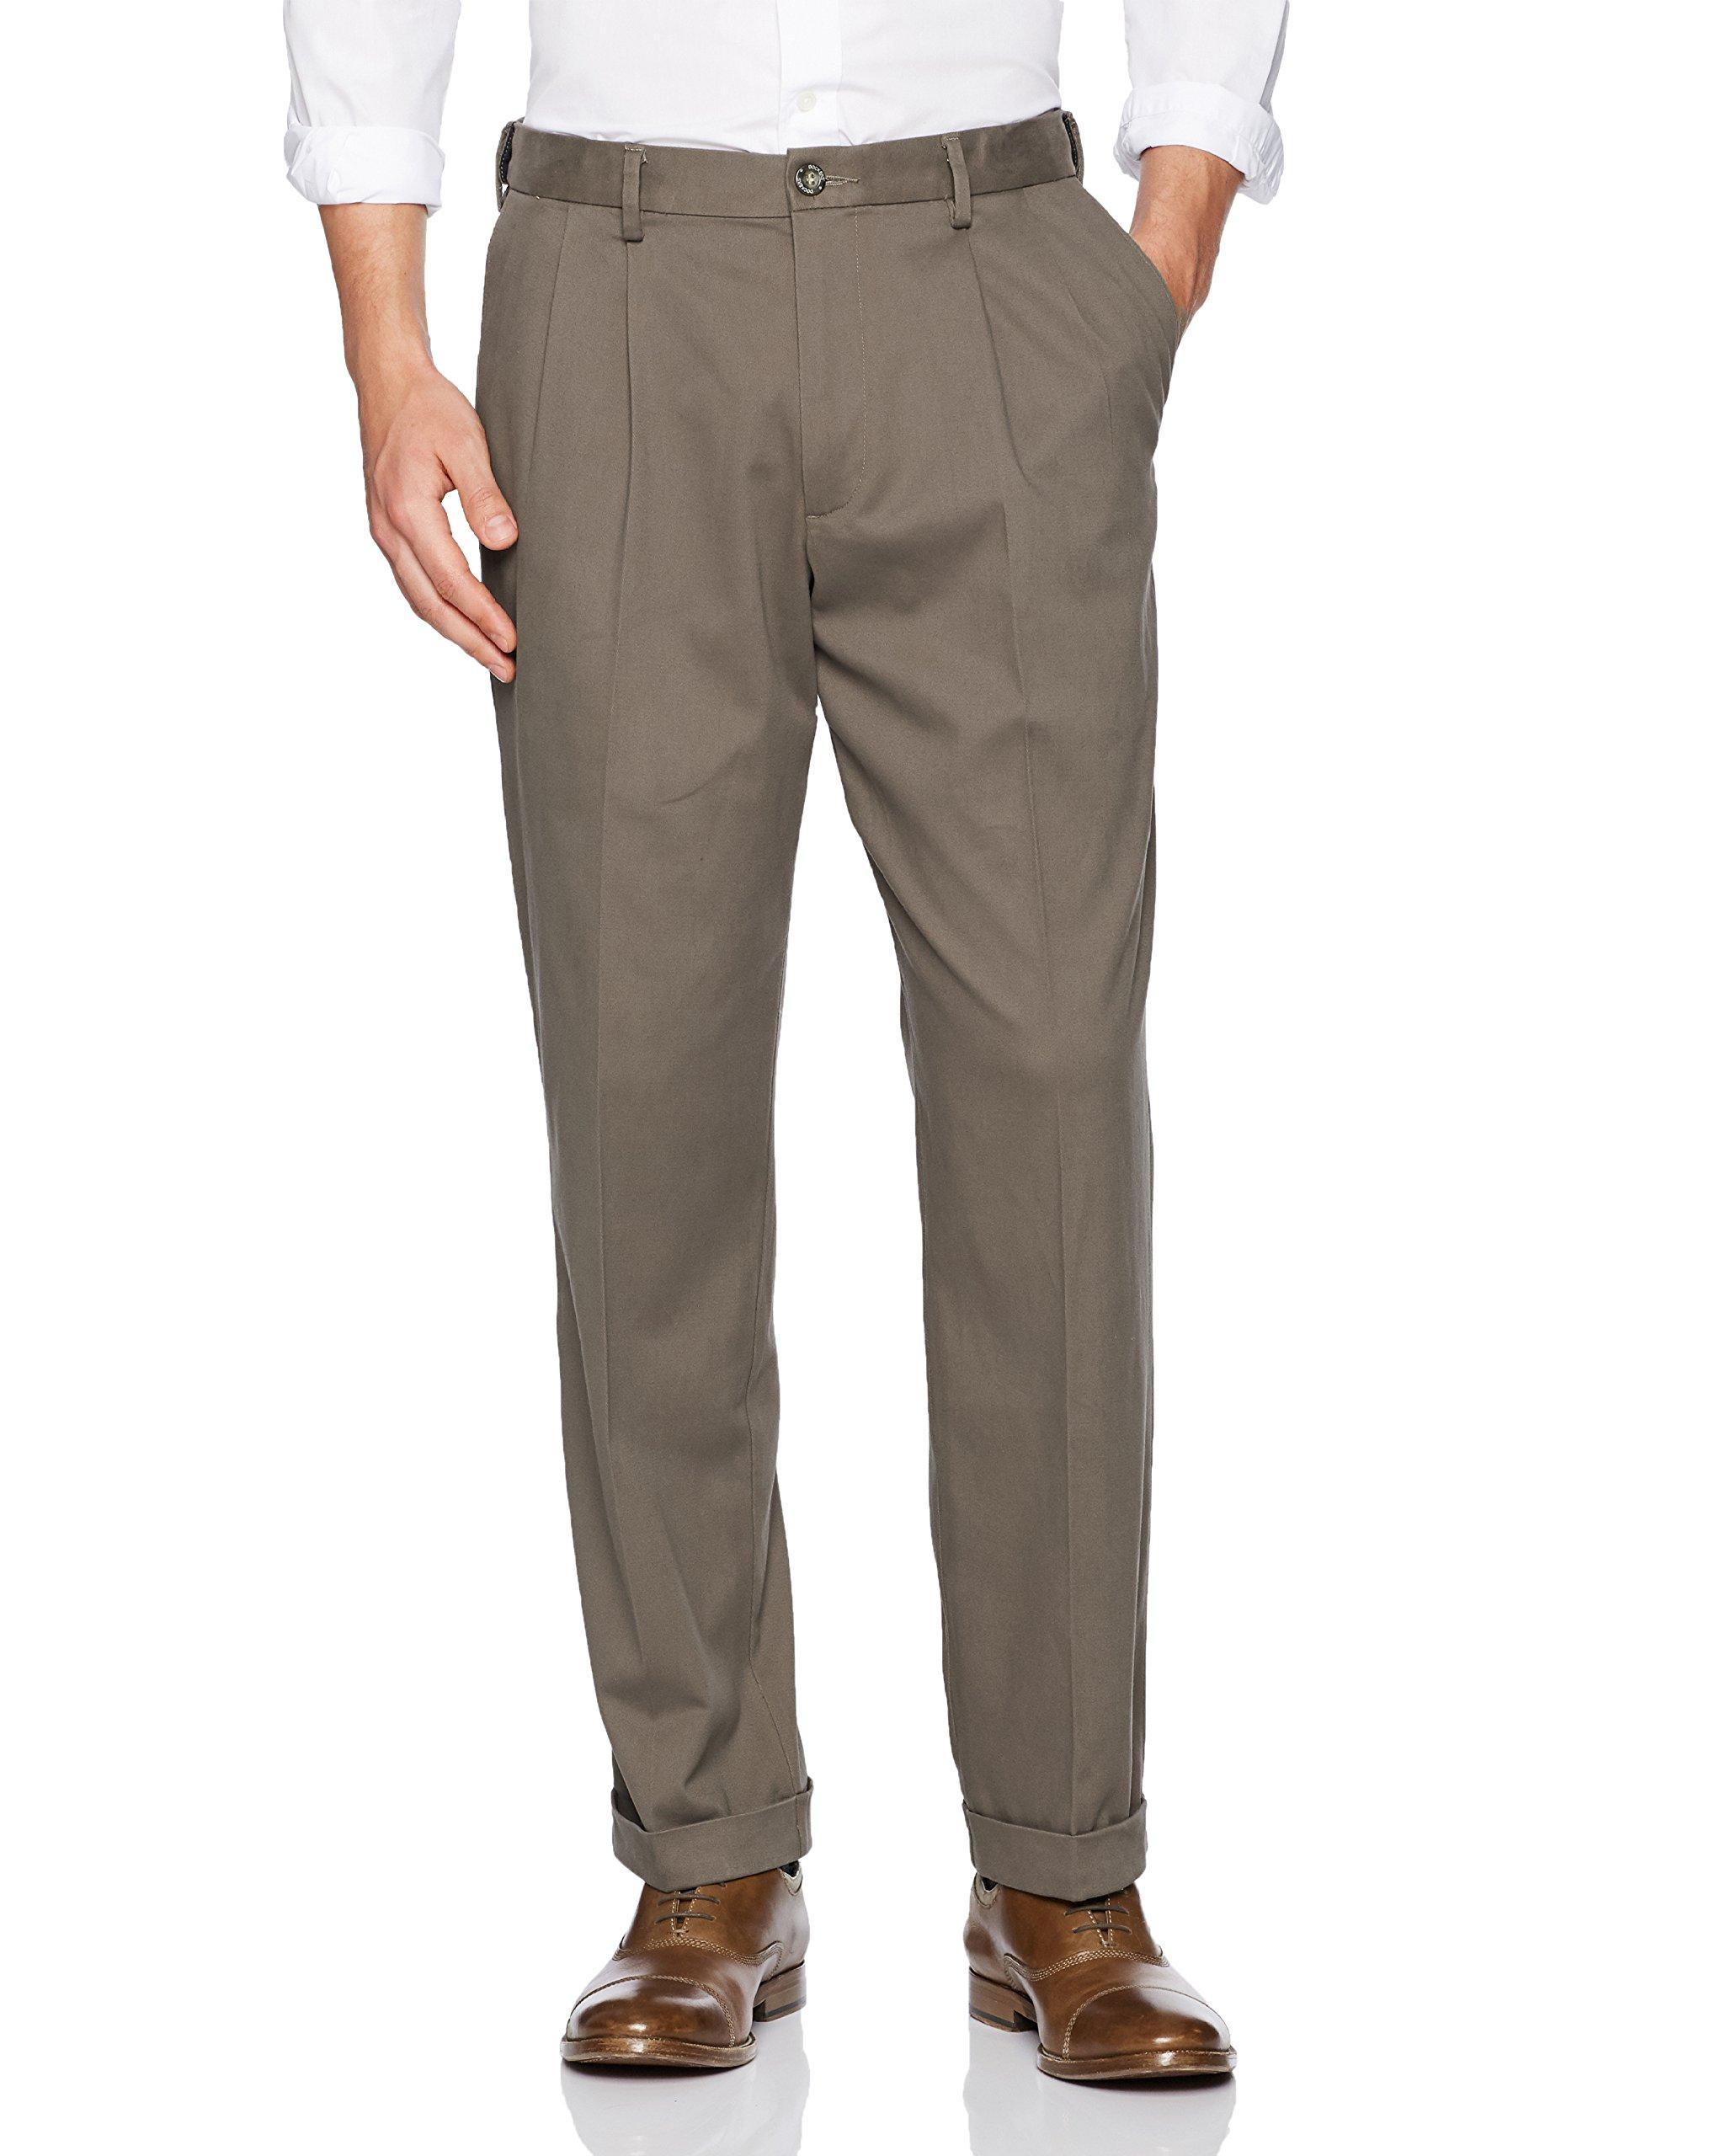 Dockers Men's Relaxed Fit Comfort Khaki Pleated Pants D4